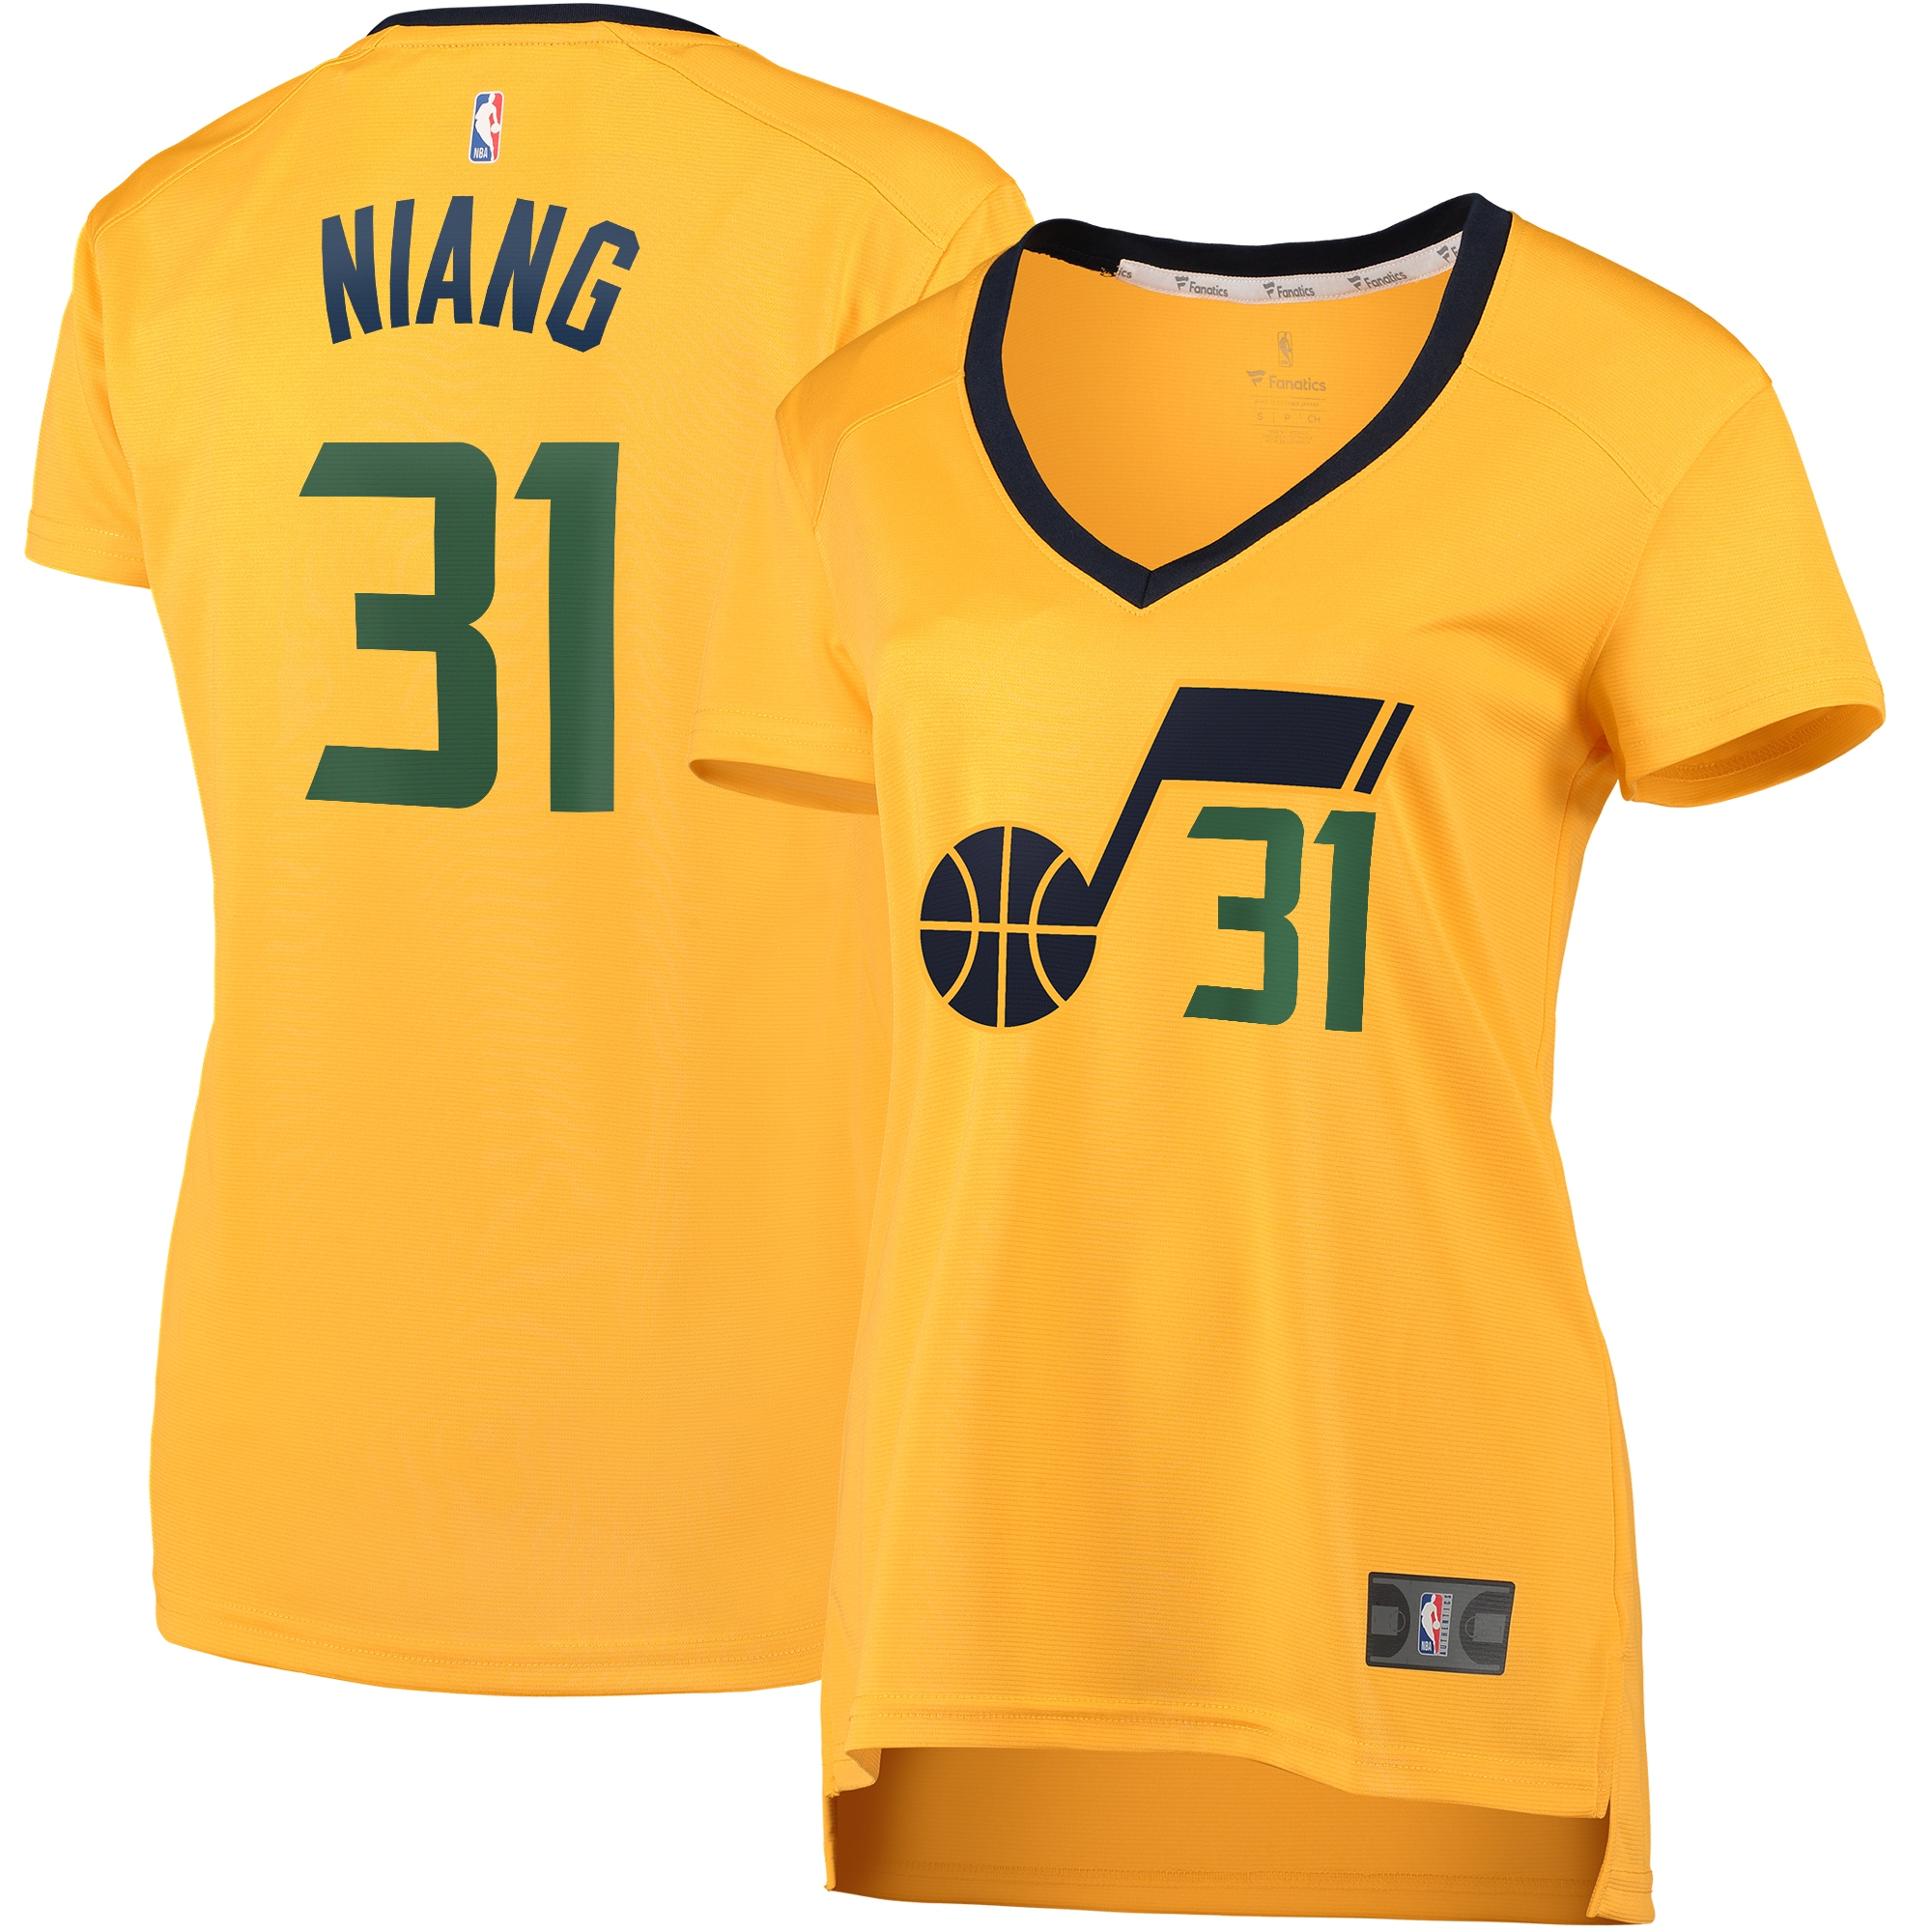 Georges Niang Utah Jazz Fanatics Branded Women's Fast Break Player Jersey - Statement Edition - Gold